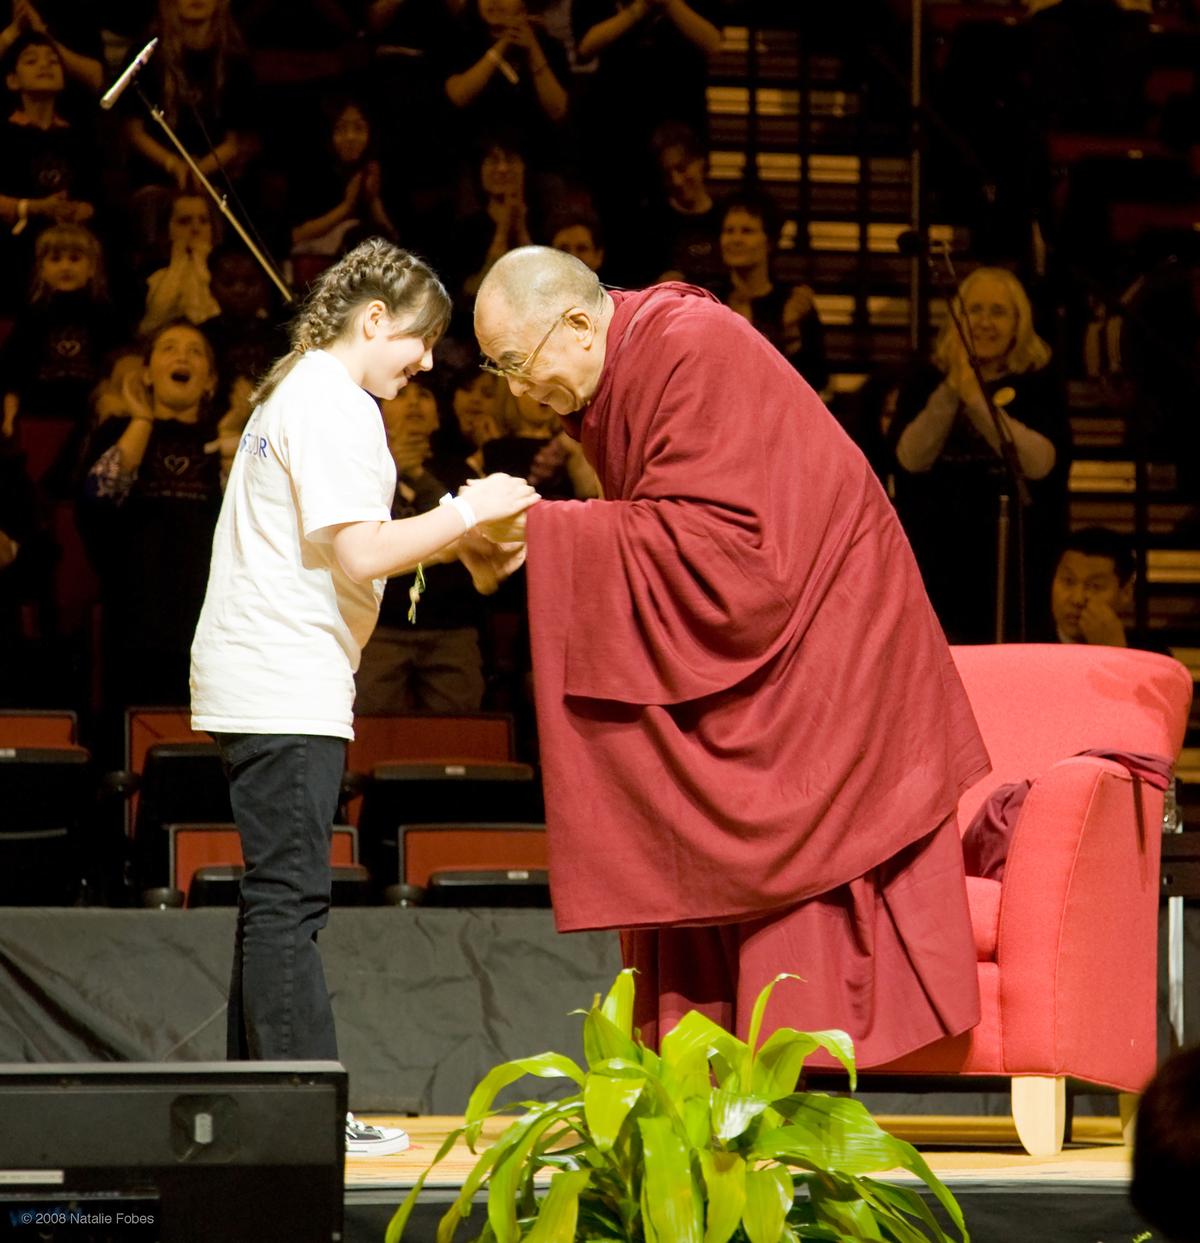 Jessica with His Holiness the Dalai Lama.